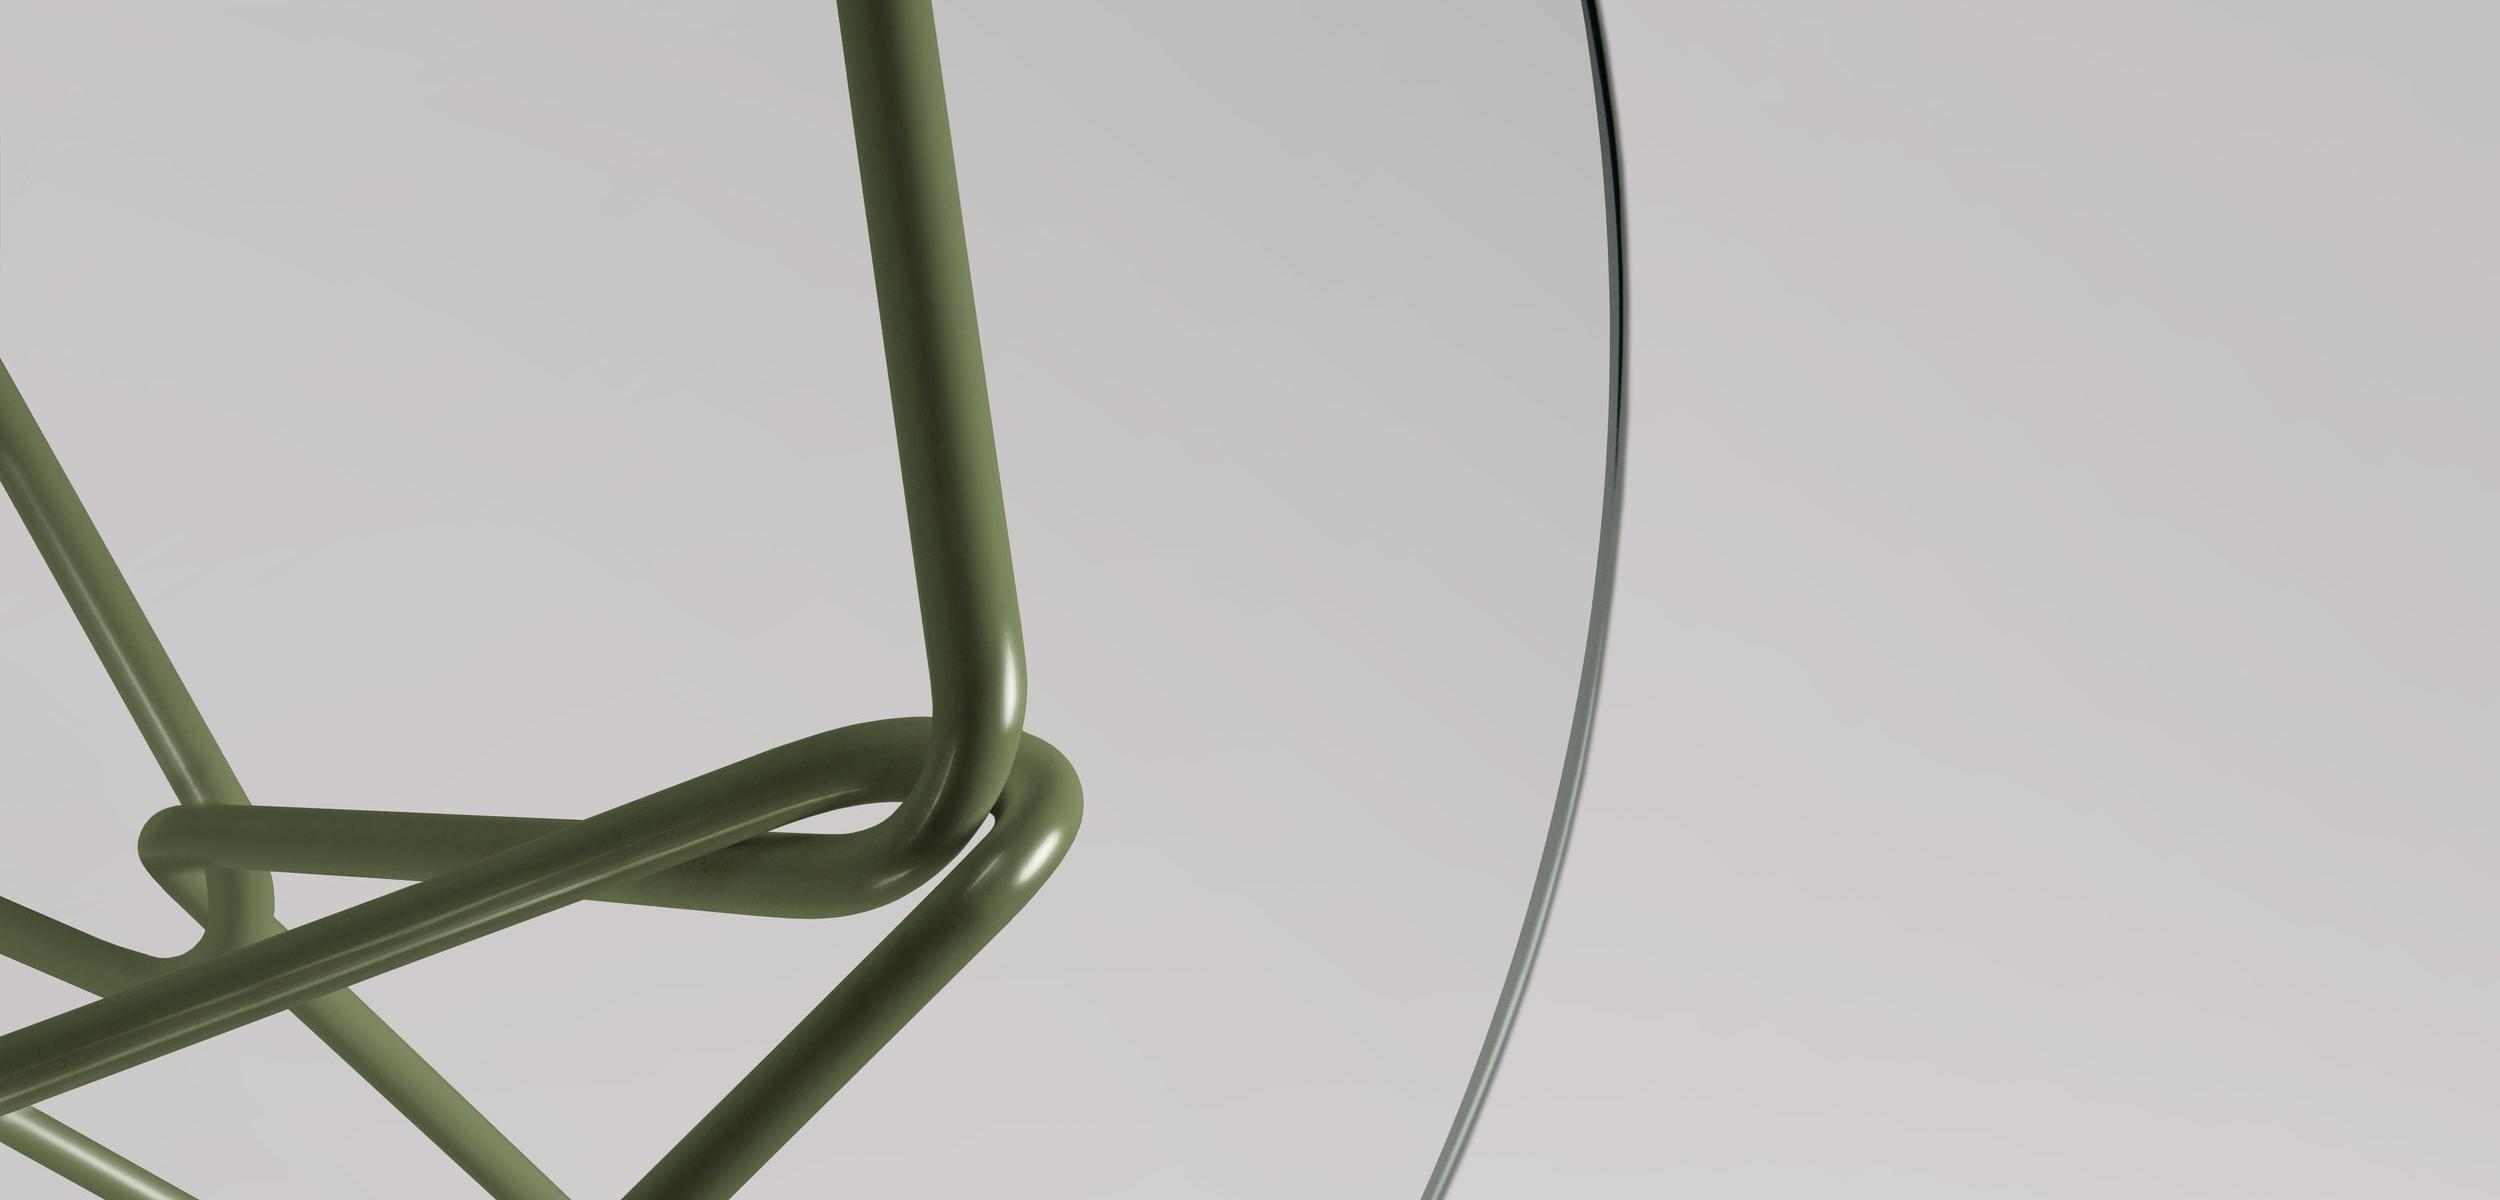 002-006 Olive Powdercoat - Glass - Detail2.jpg